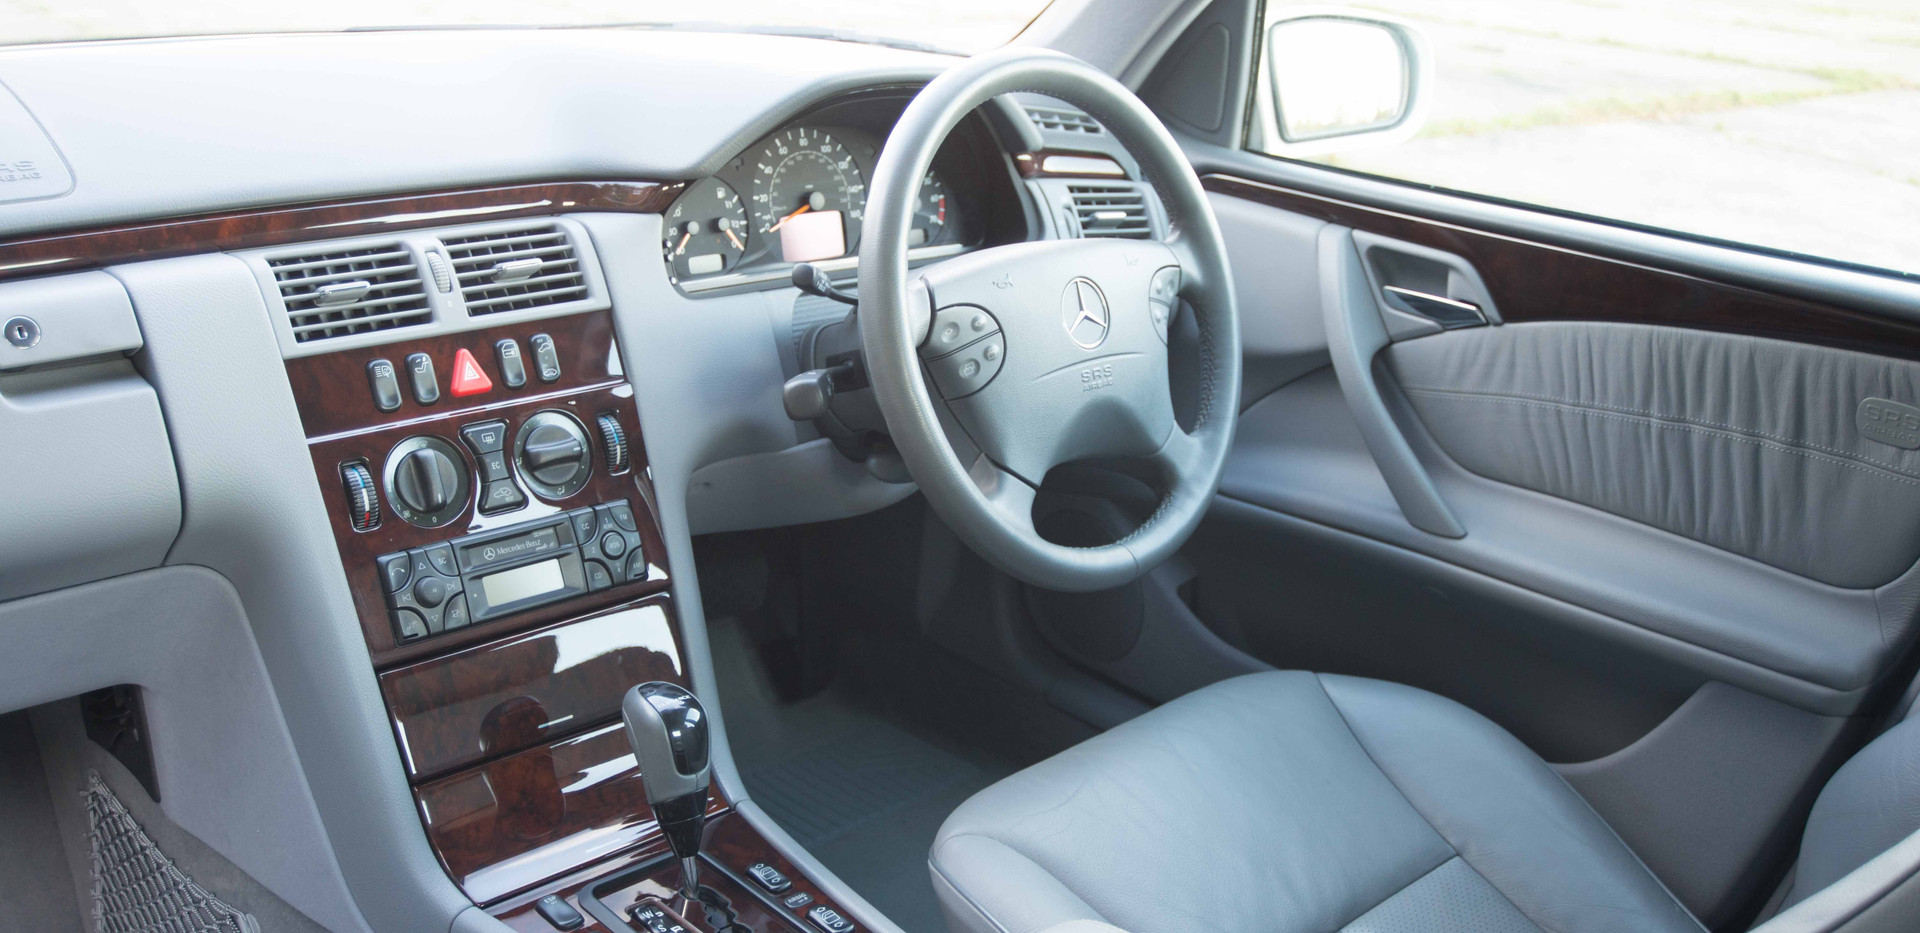 Mercedes E240 For Sale UK London  (67 of